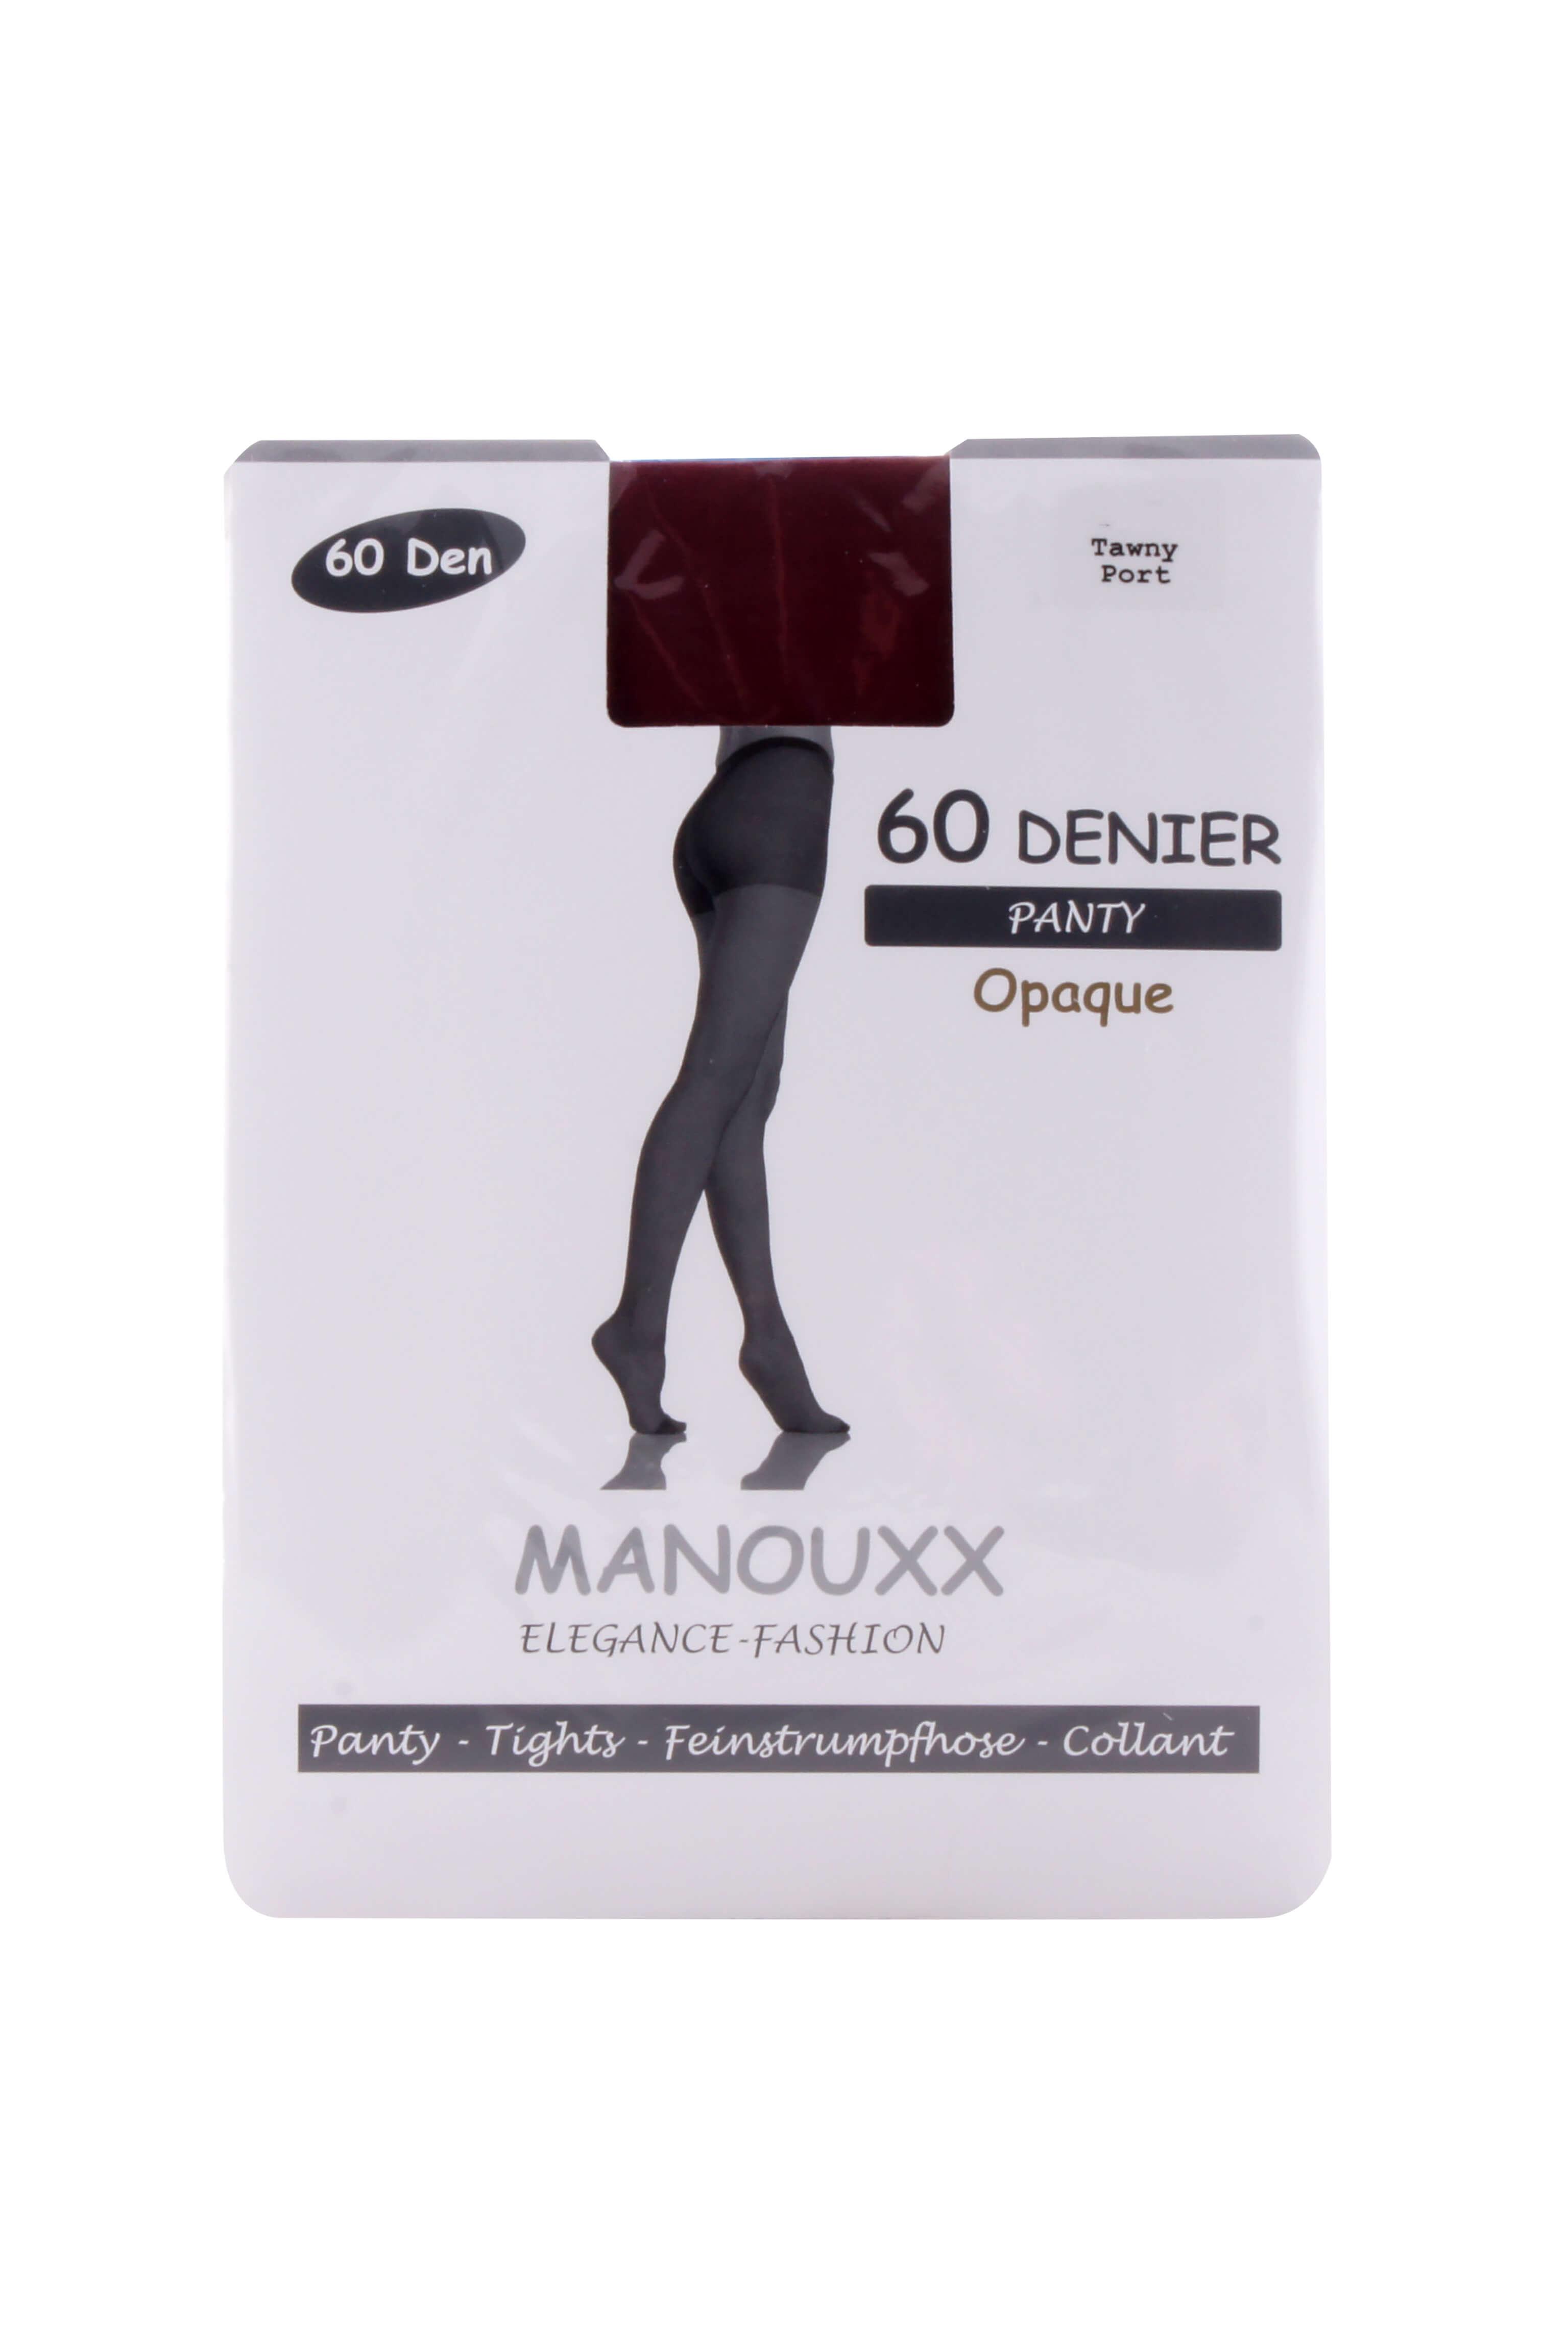 Manouxx Panty Opaque 60 Den Tawny Port